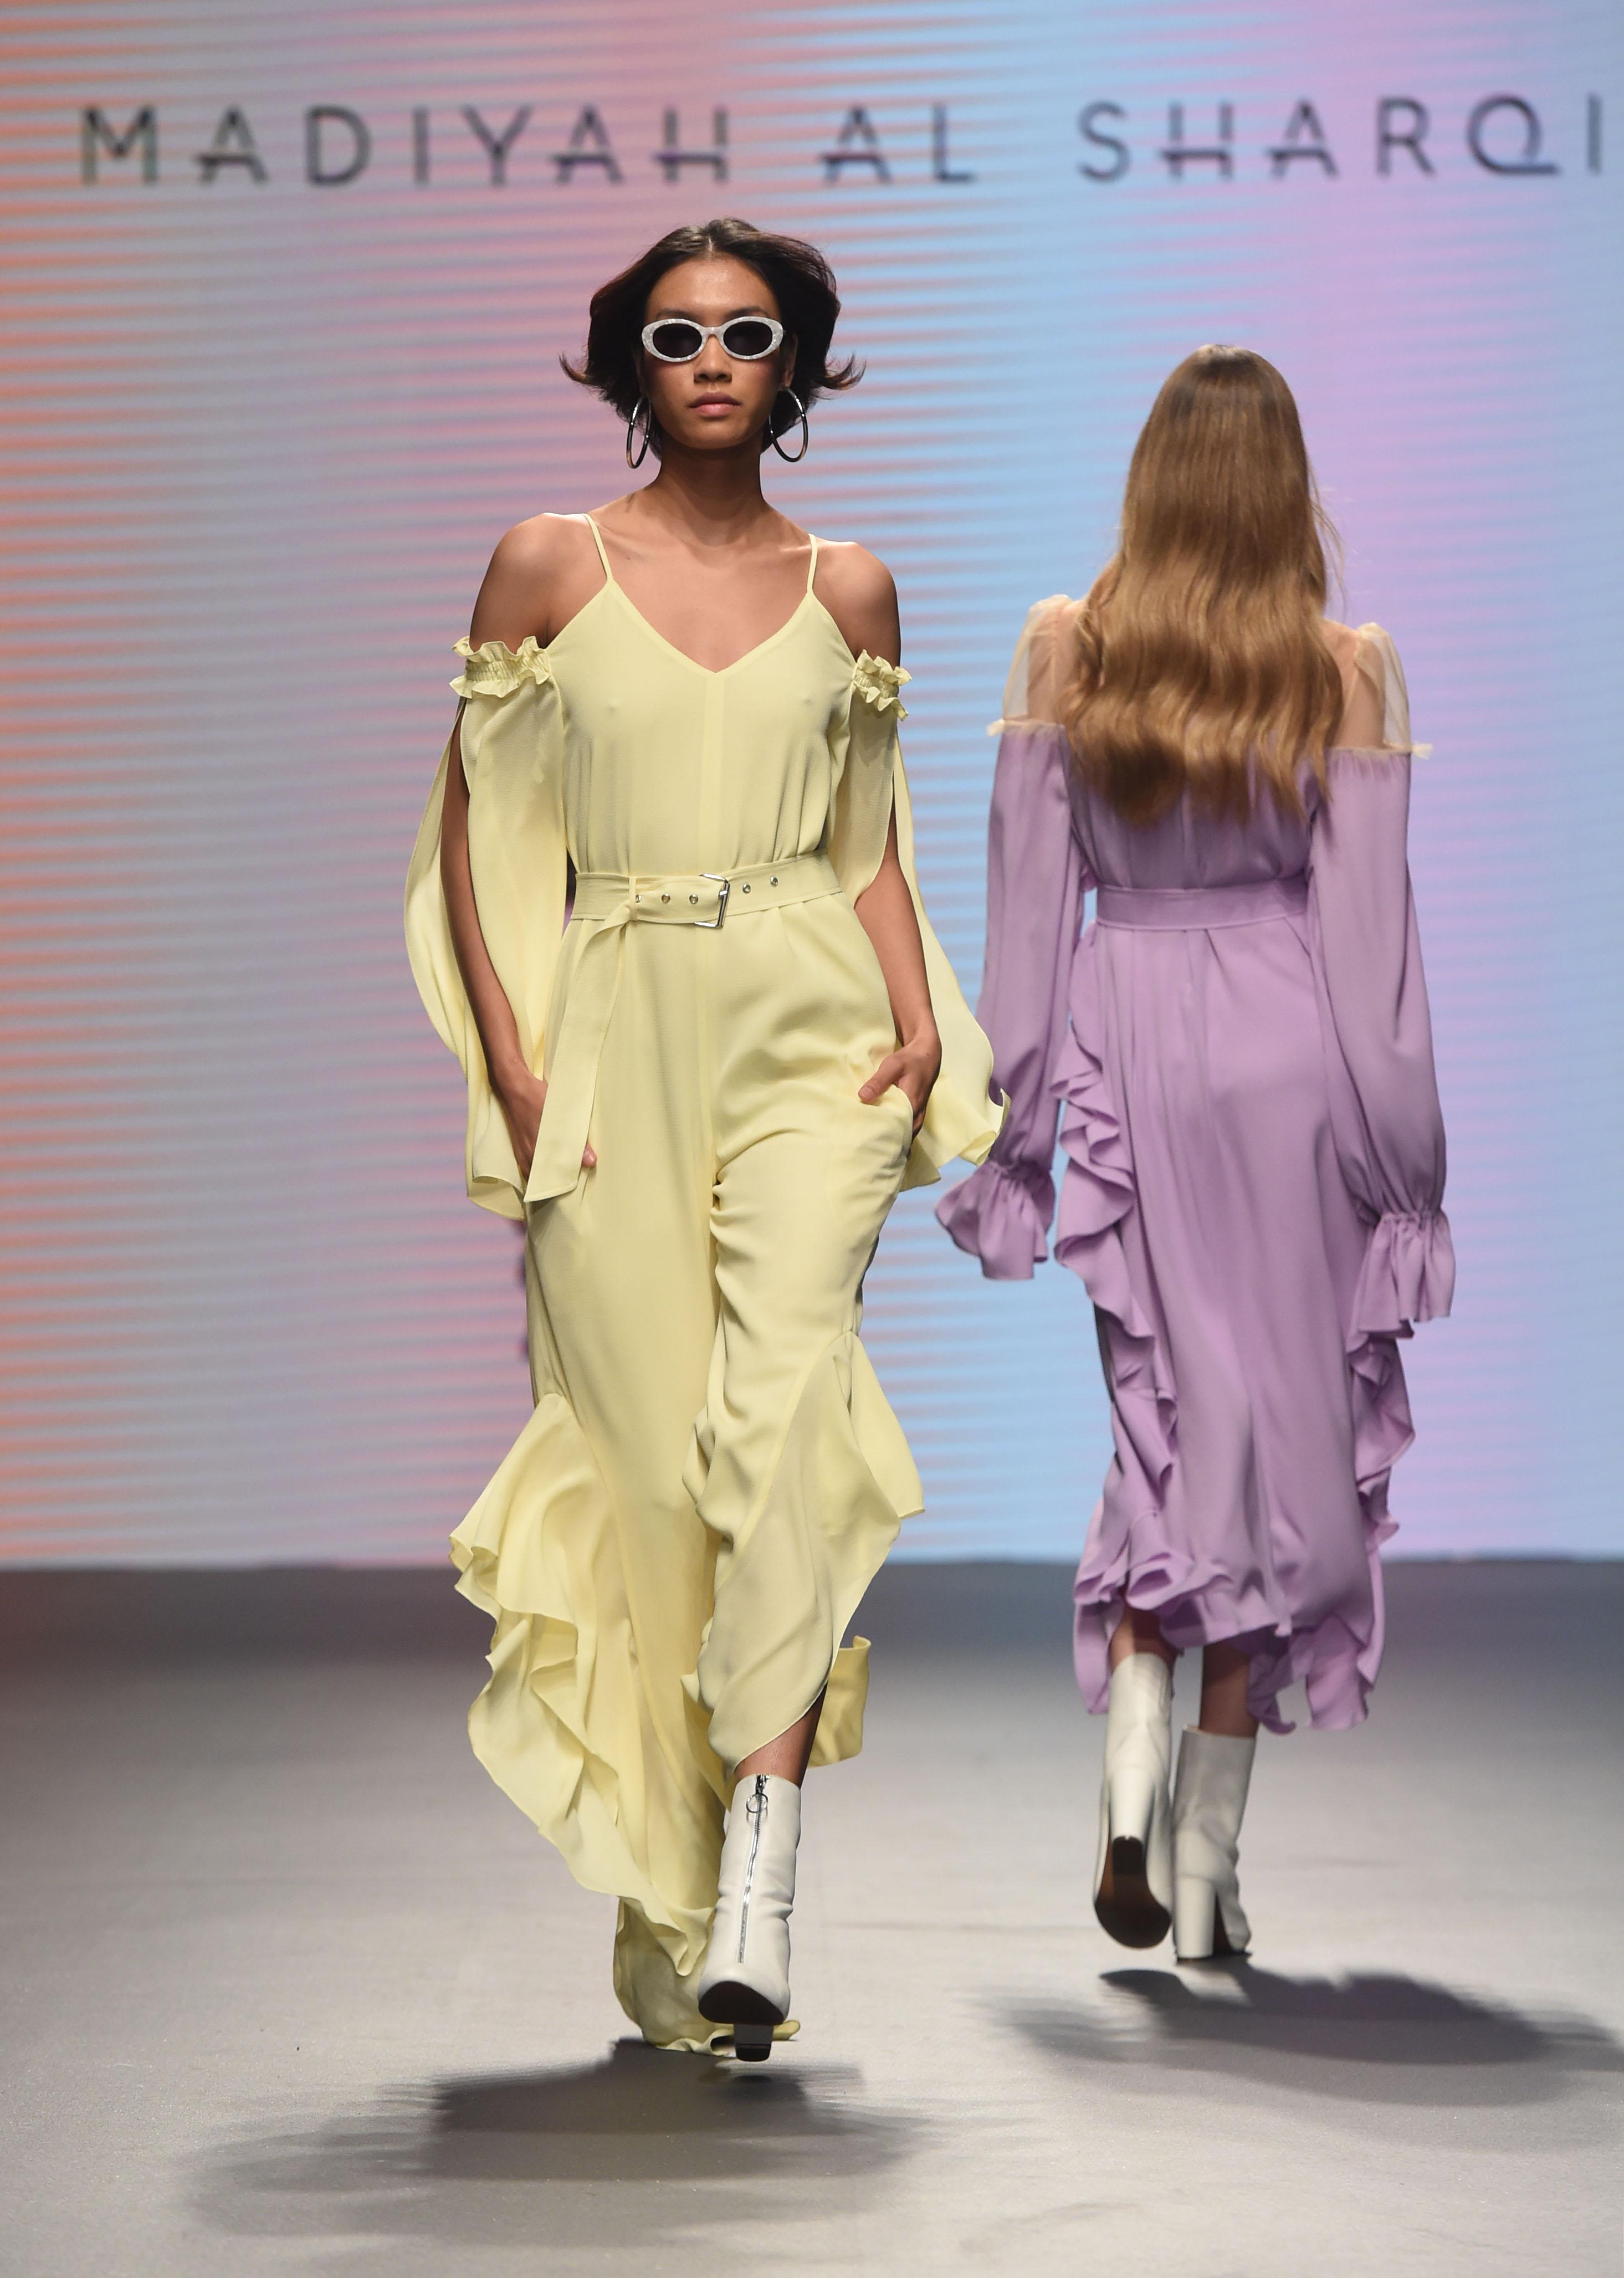 Madiyah Al Sharqi - Fashion Forward Dubai Season 10, October 2017 - Photography by Getty Images